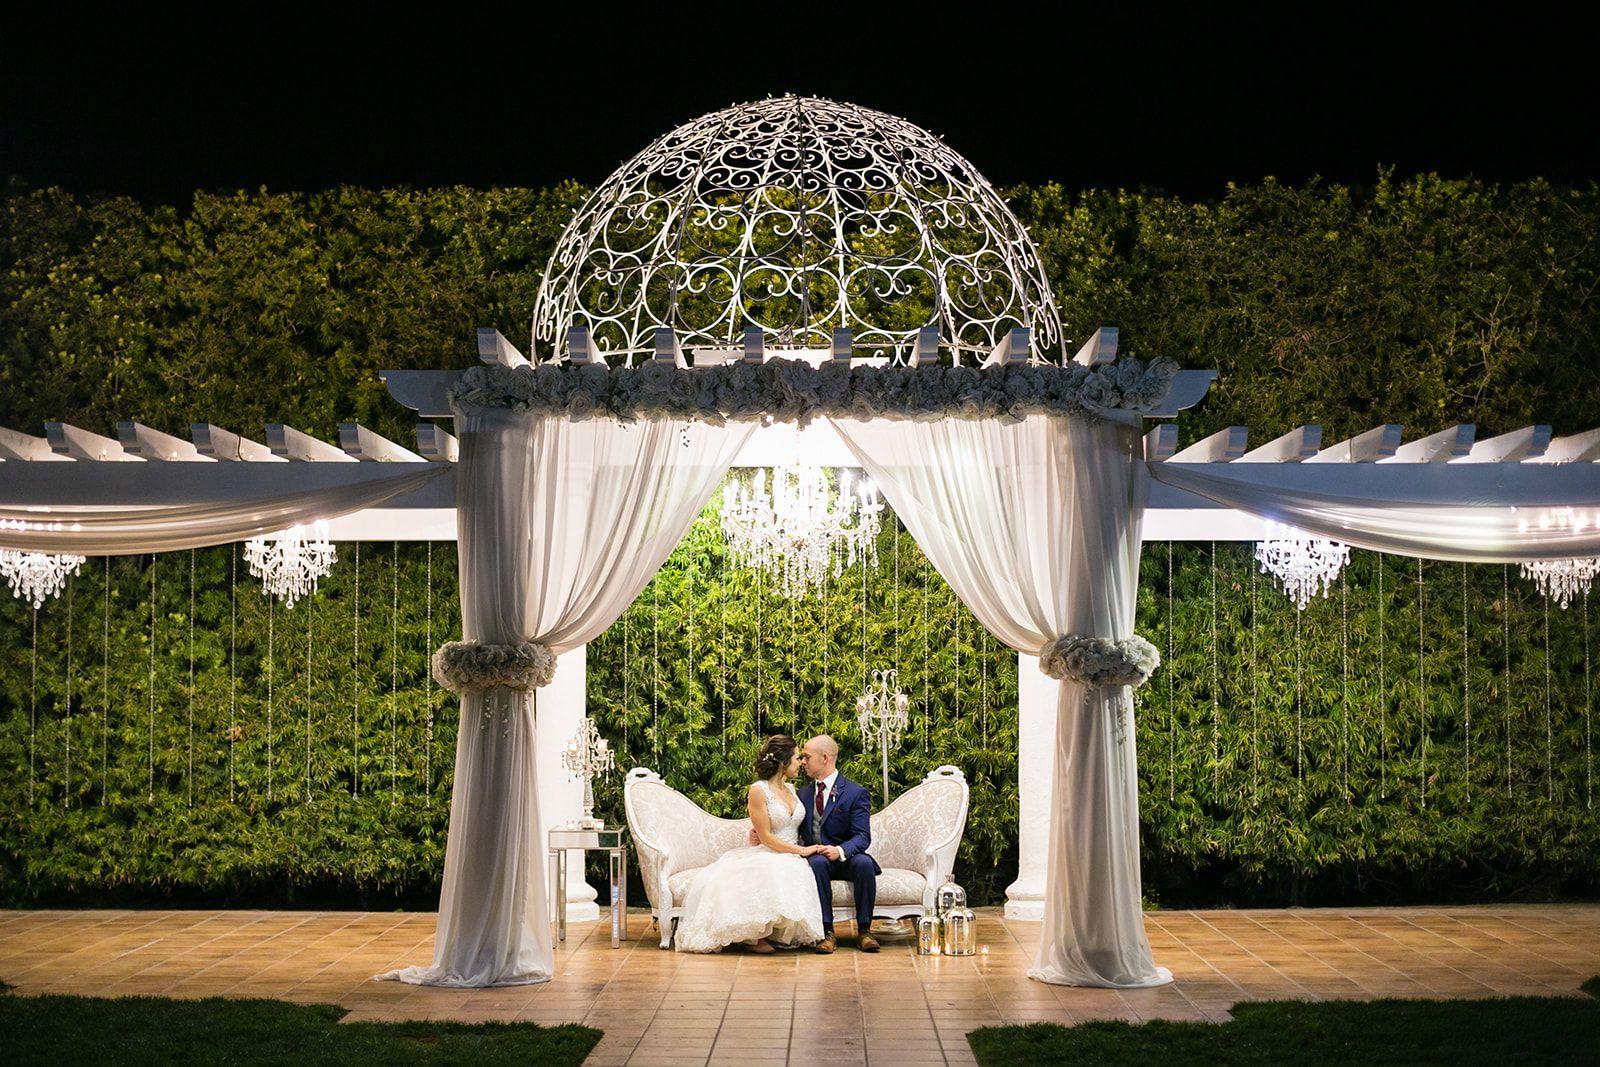 Villa De Amore Wedding Venue In Temecula California The Studio